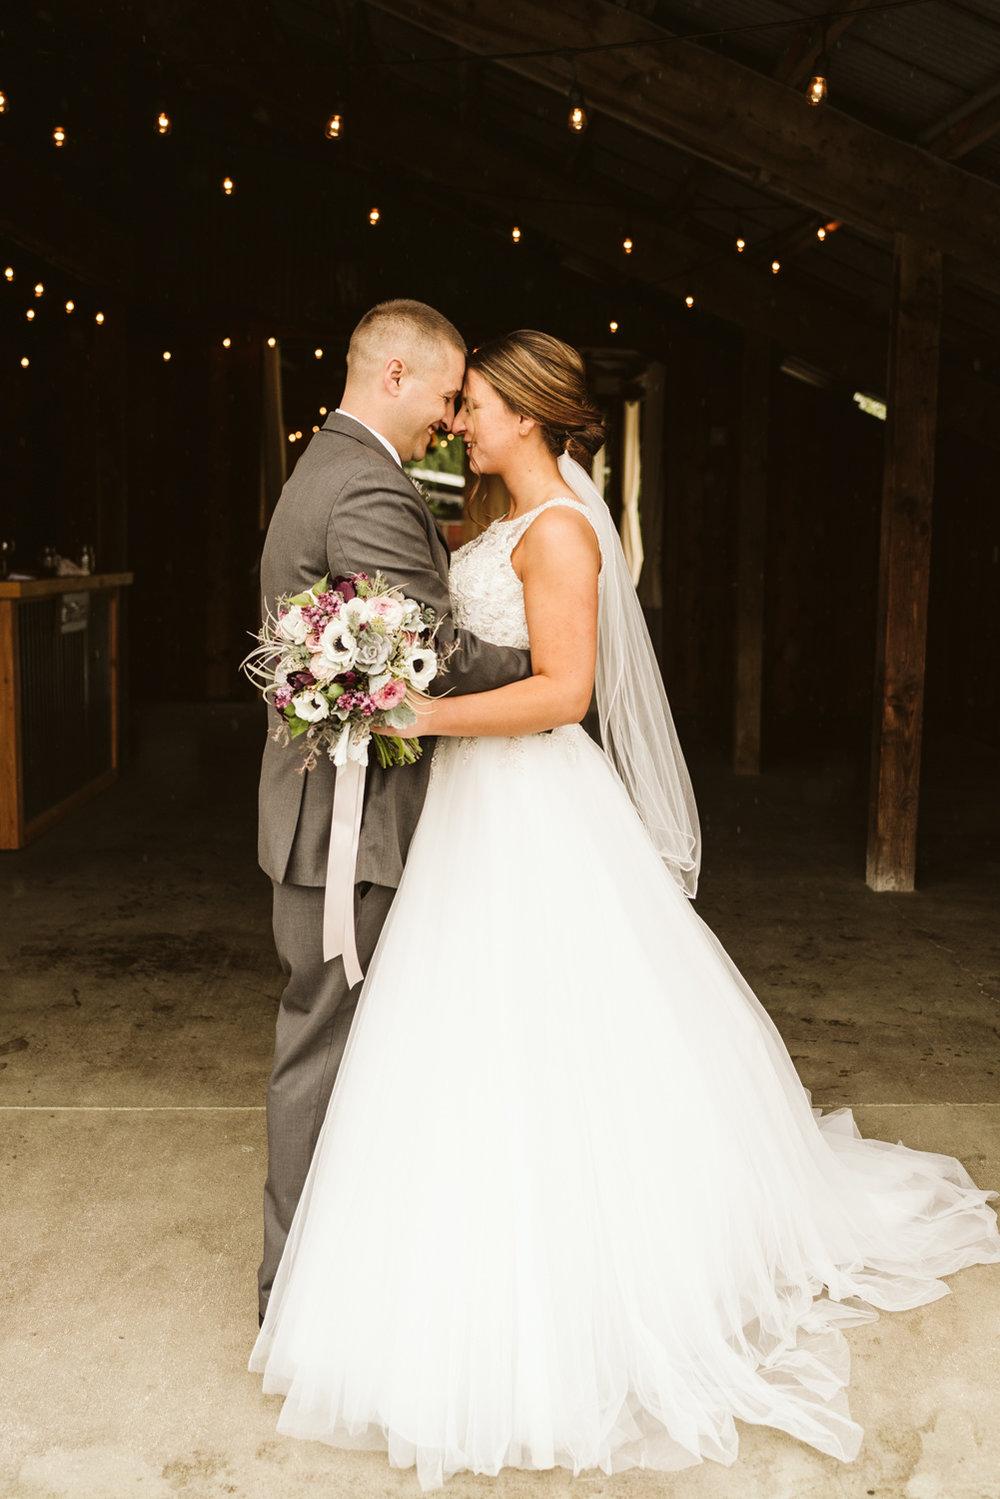 April Yentas Photography - jen and anthony wedding-59.jpg